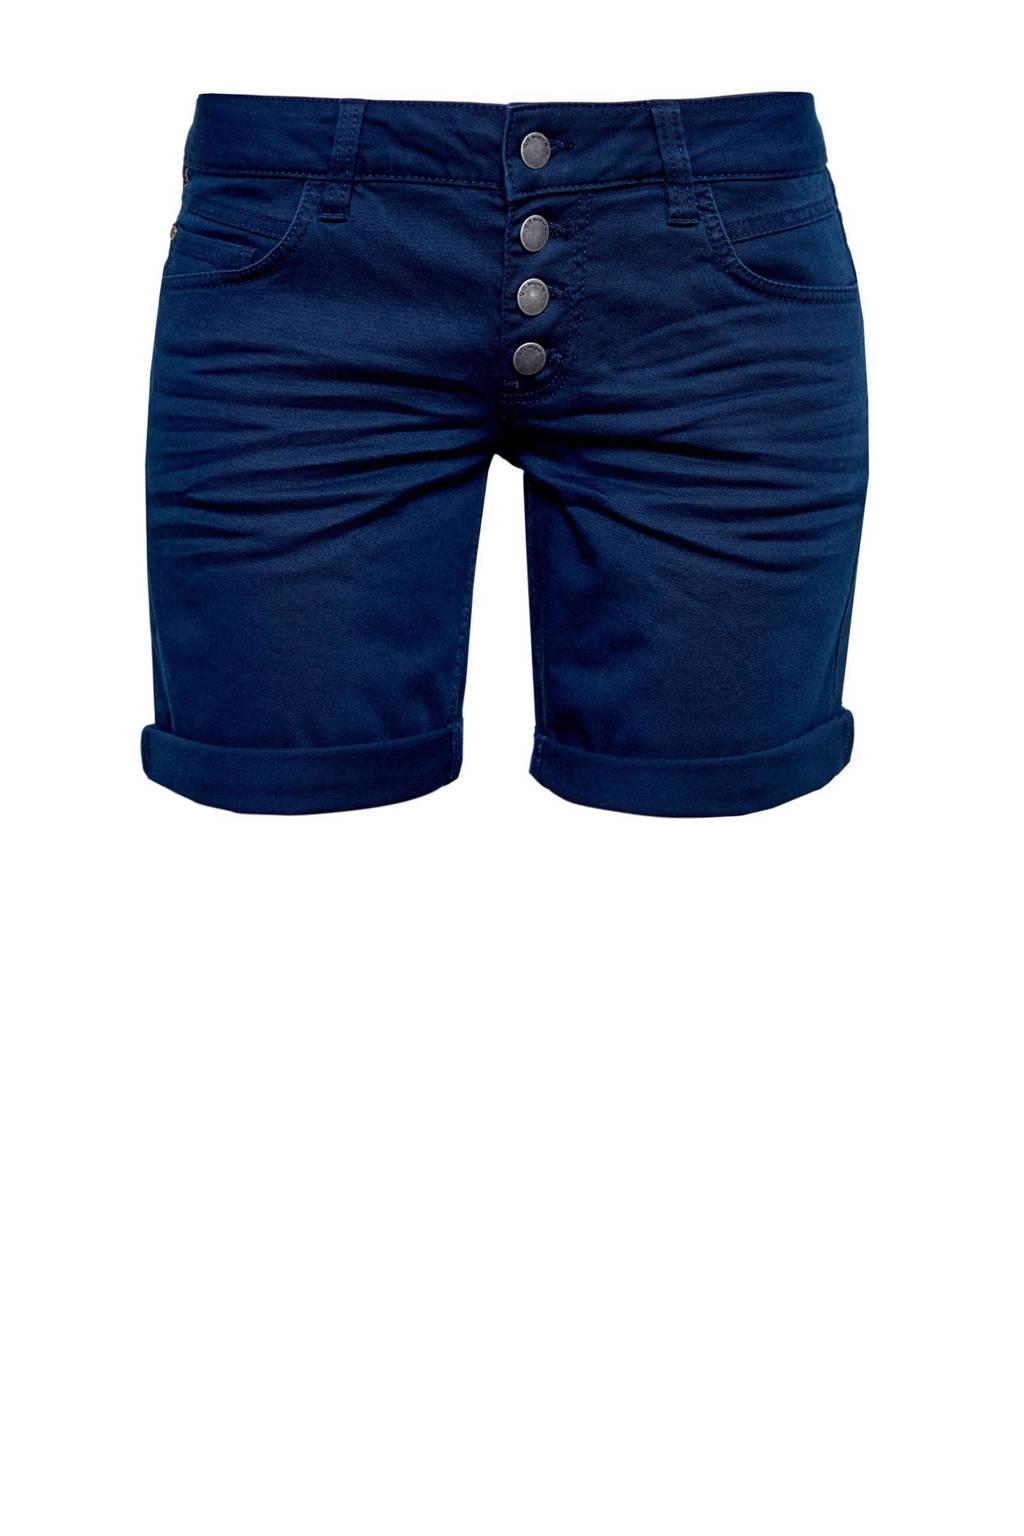 Q/S designed by regular fit short donkerblauw, Donkerblauw